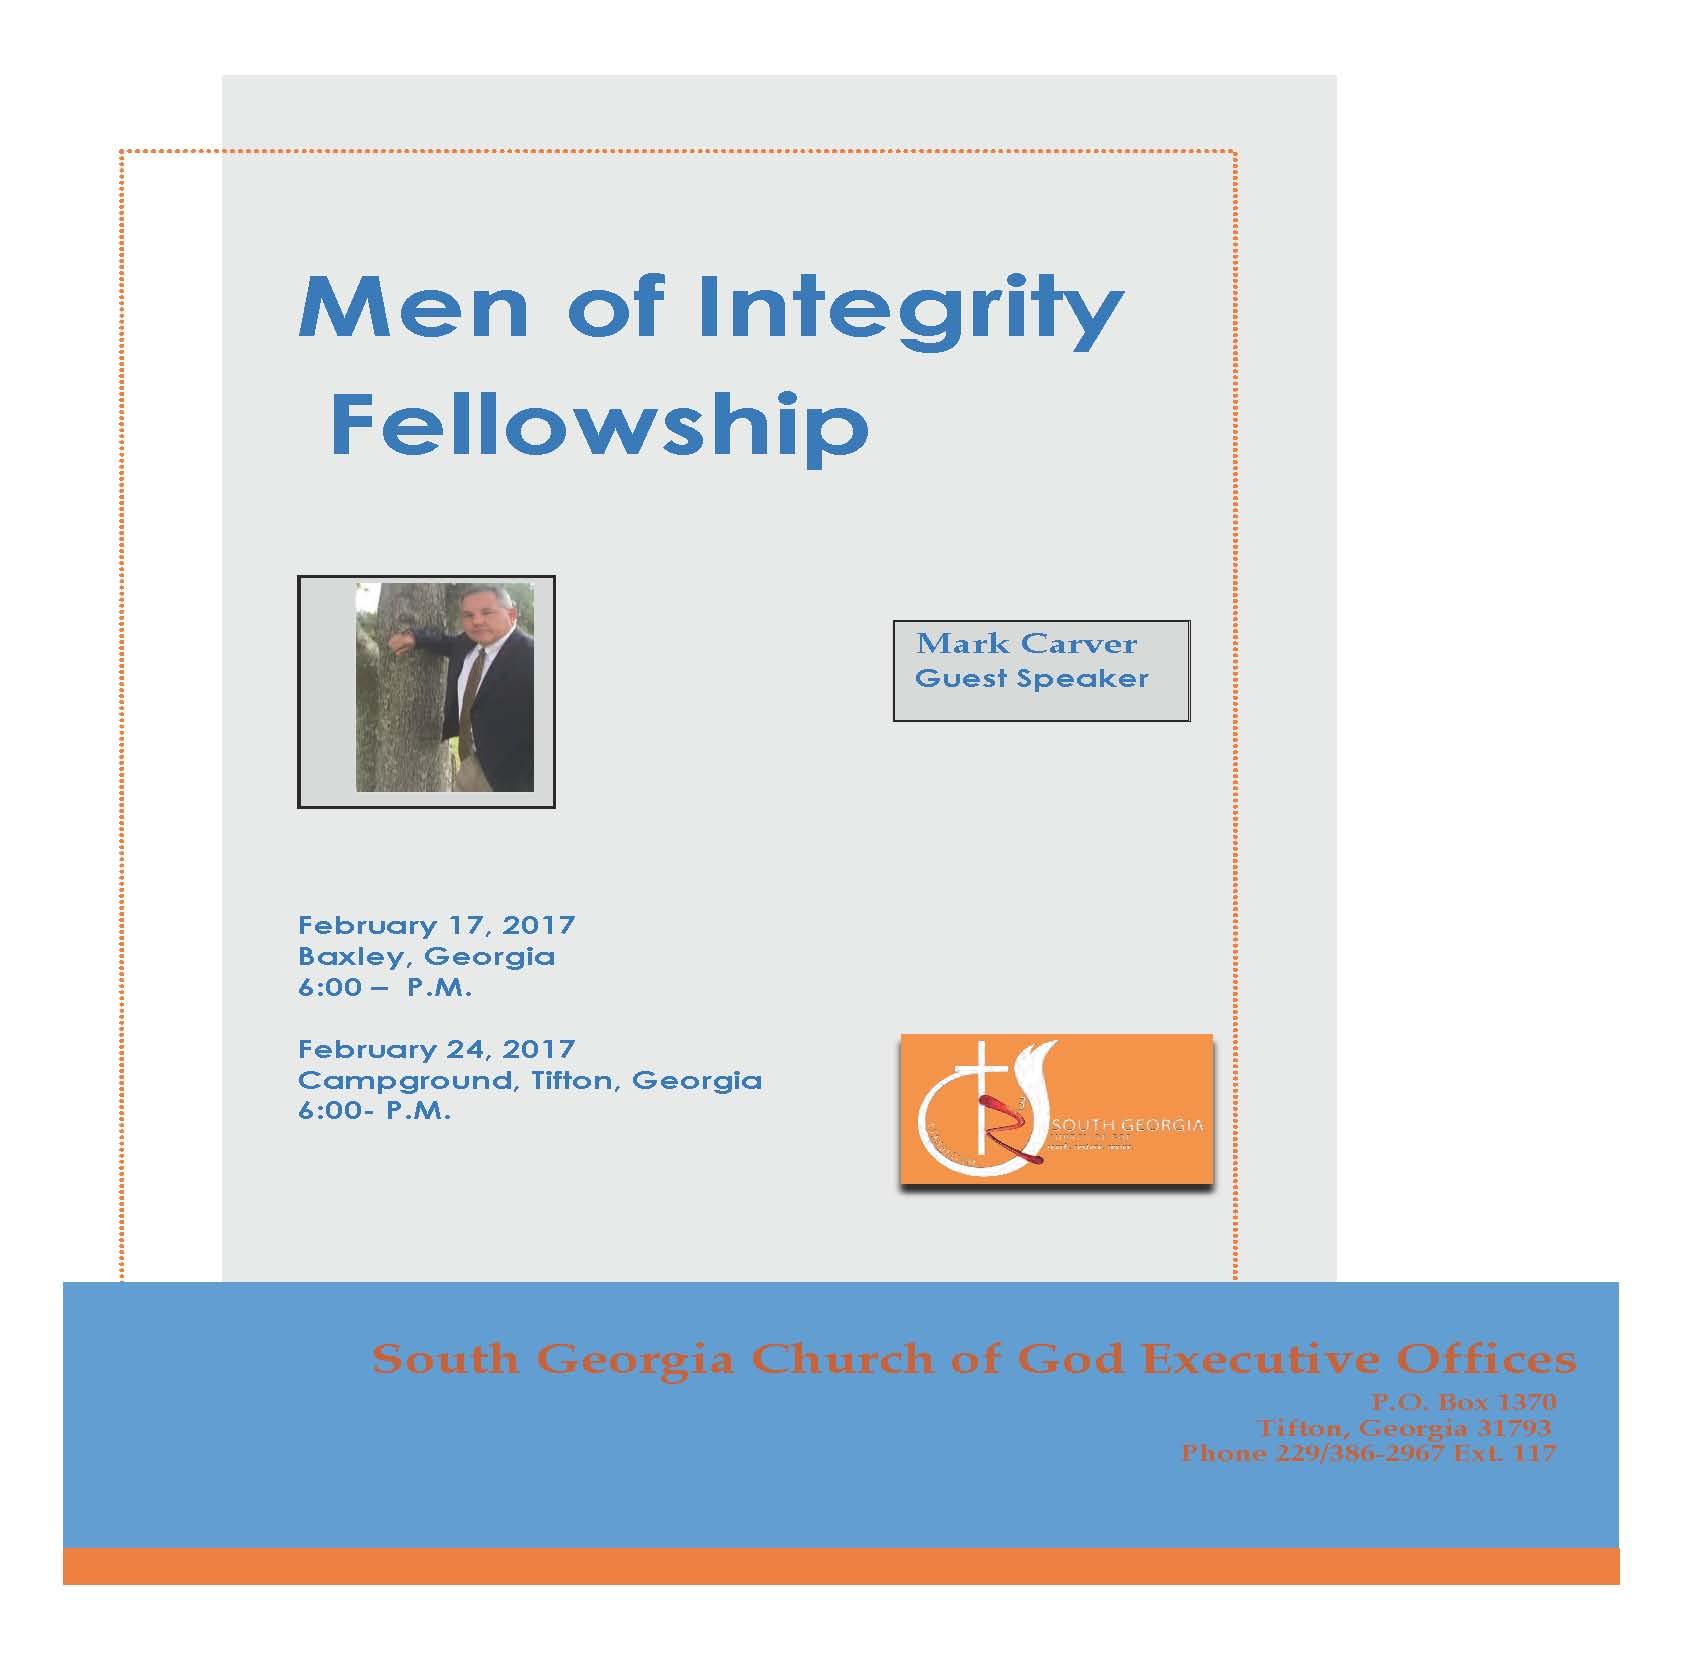 men-of-integrity